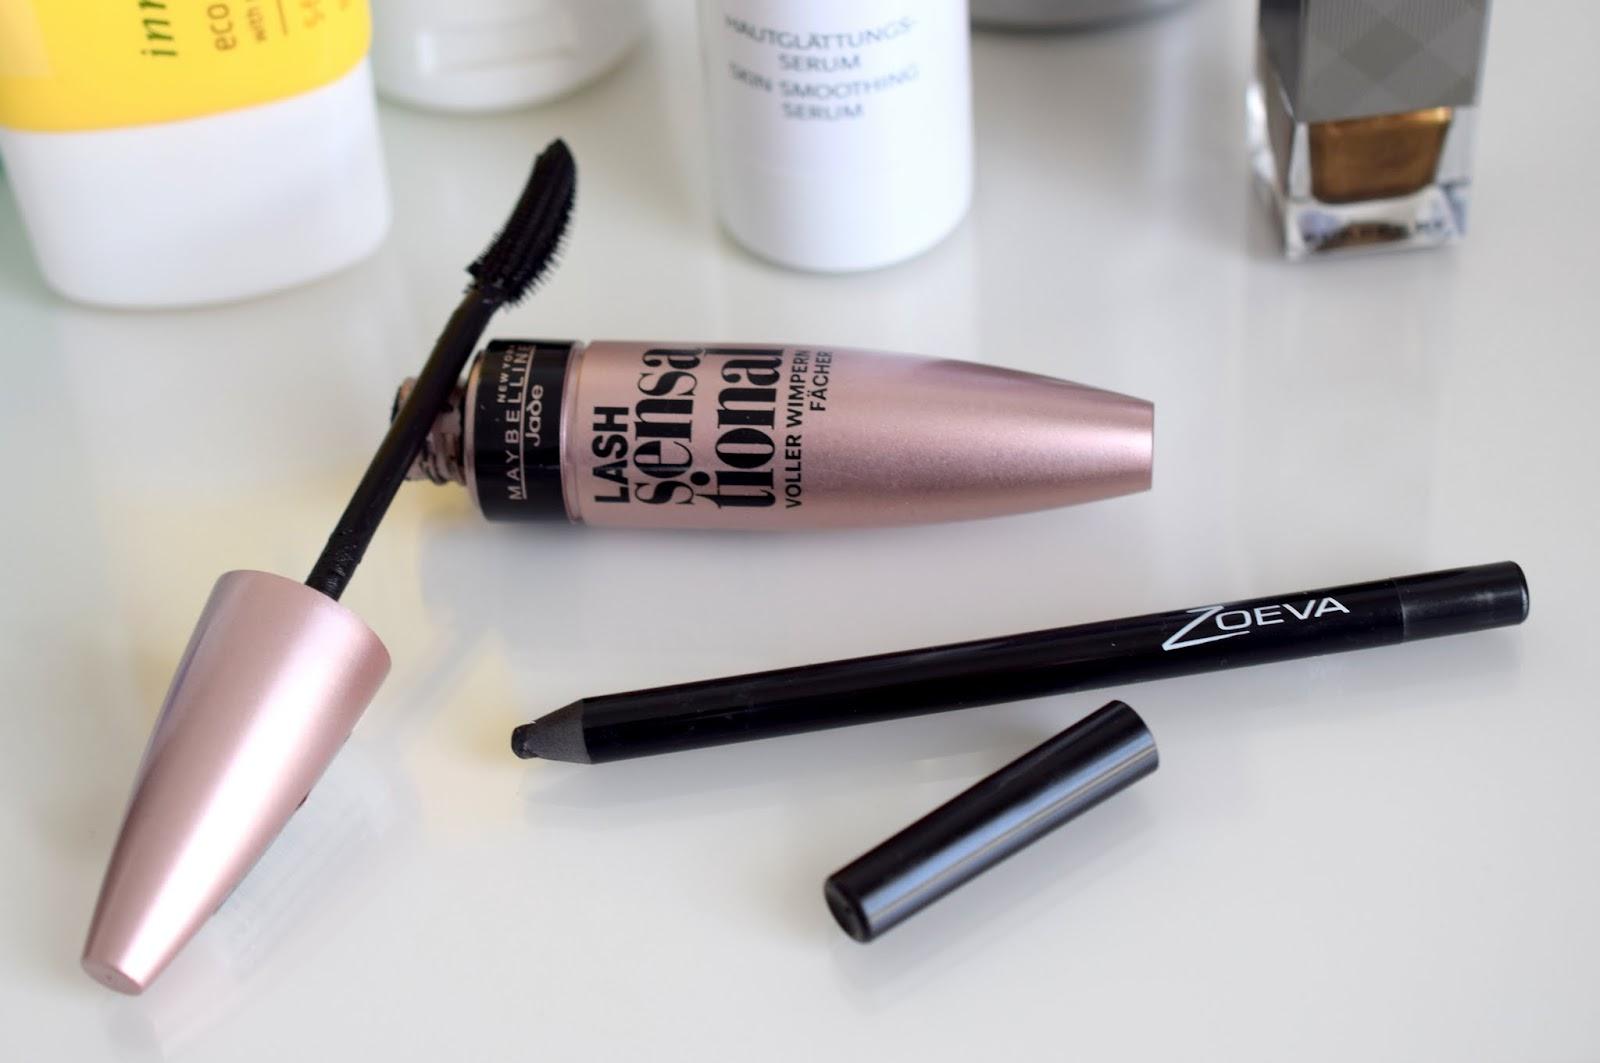 Maybelline Lash Sensational Mascara und Zoeva Grahpic Eyes Waterproof Eyeliner NYX